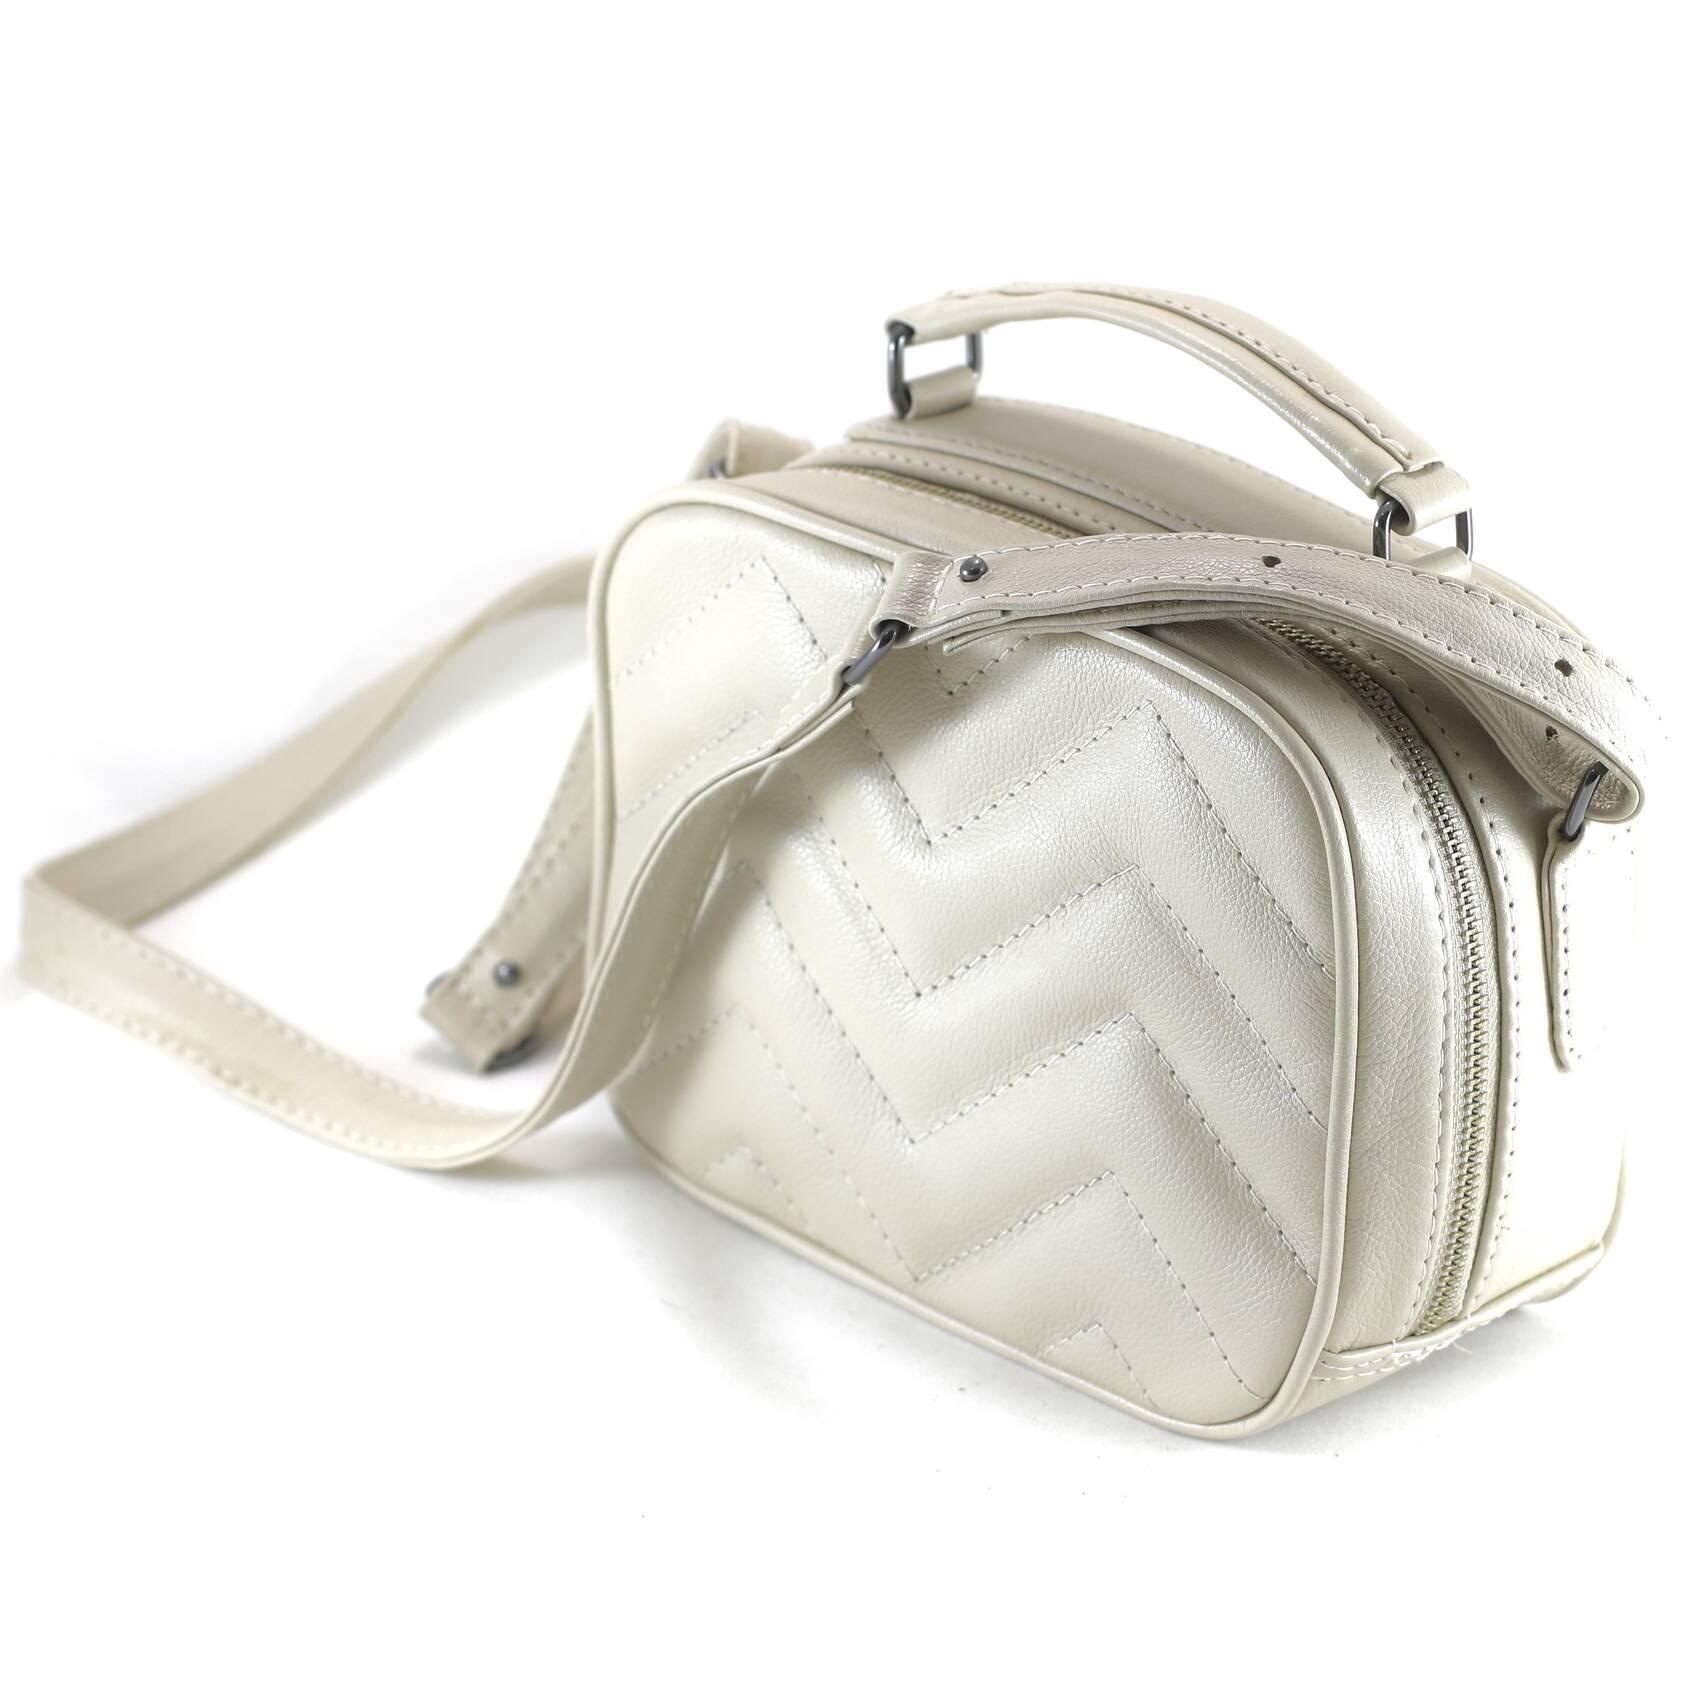 SANTORINI Bolsa quadradinha basica couro legitimo branca off white